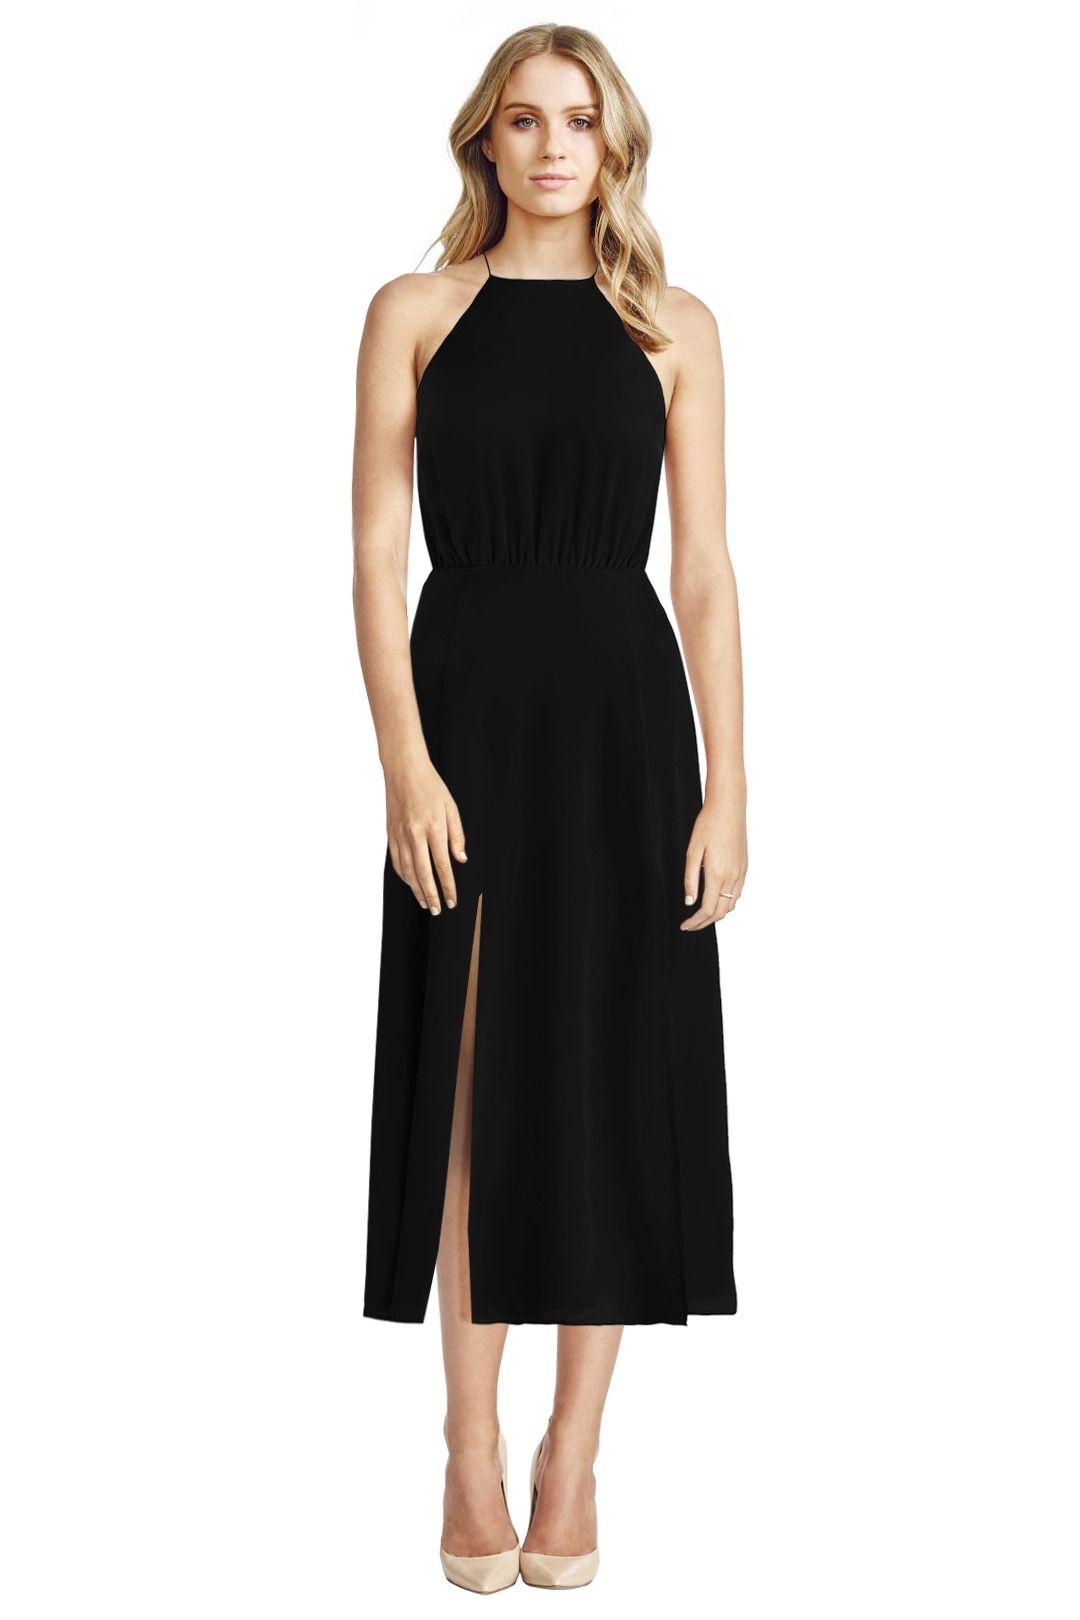 Zimmermann - Silk Picnic Dress - Black - Front